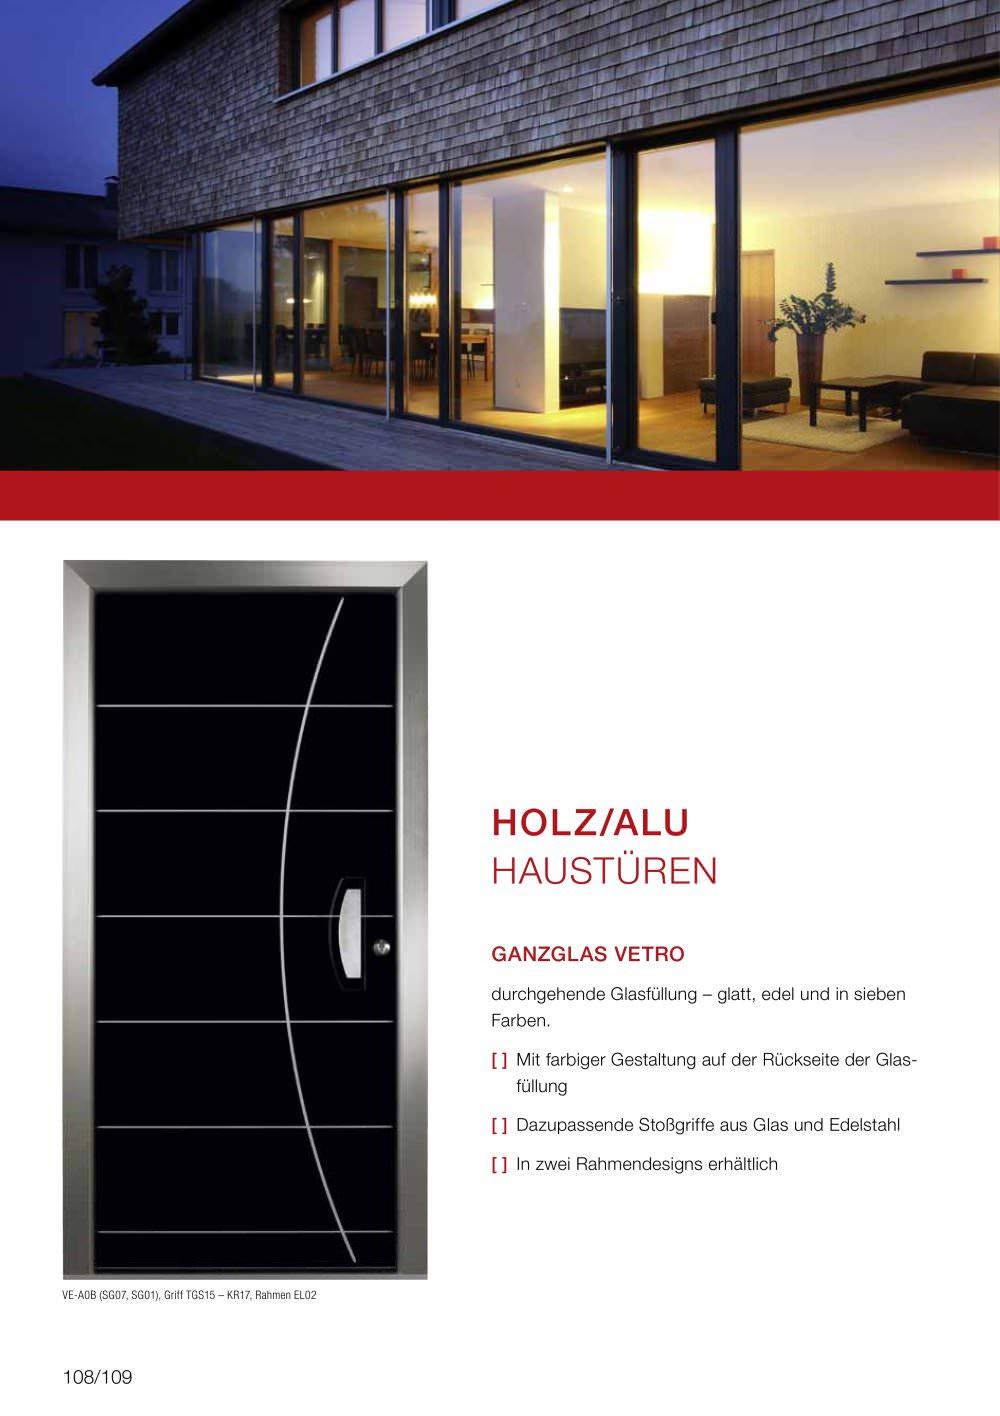 HOL Z/ALU HAUSTÜREN - Internorm - PDF Katalog | Beschreibung | Prospekt